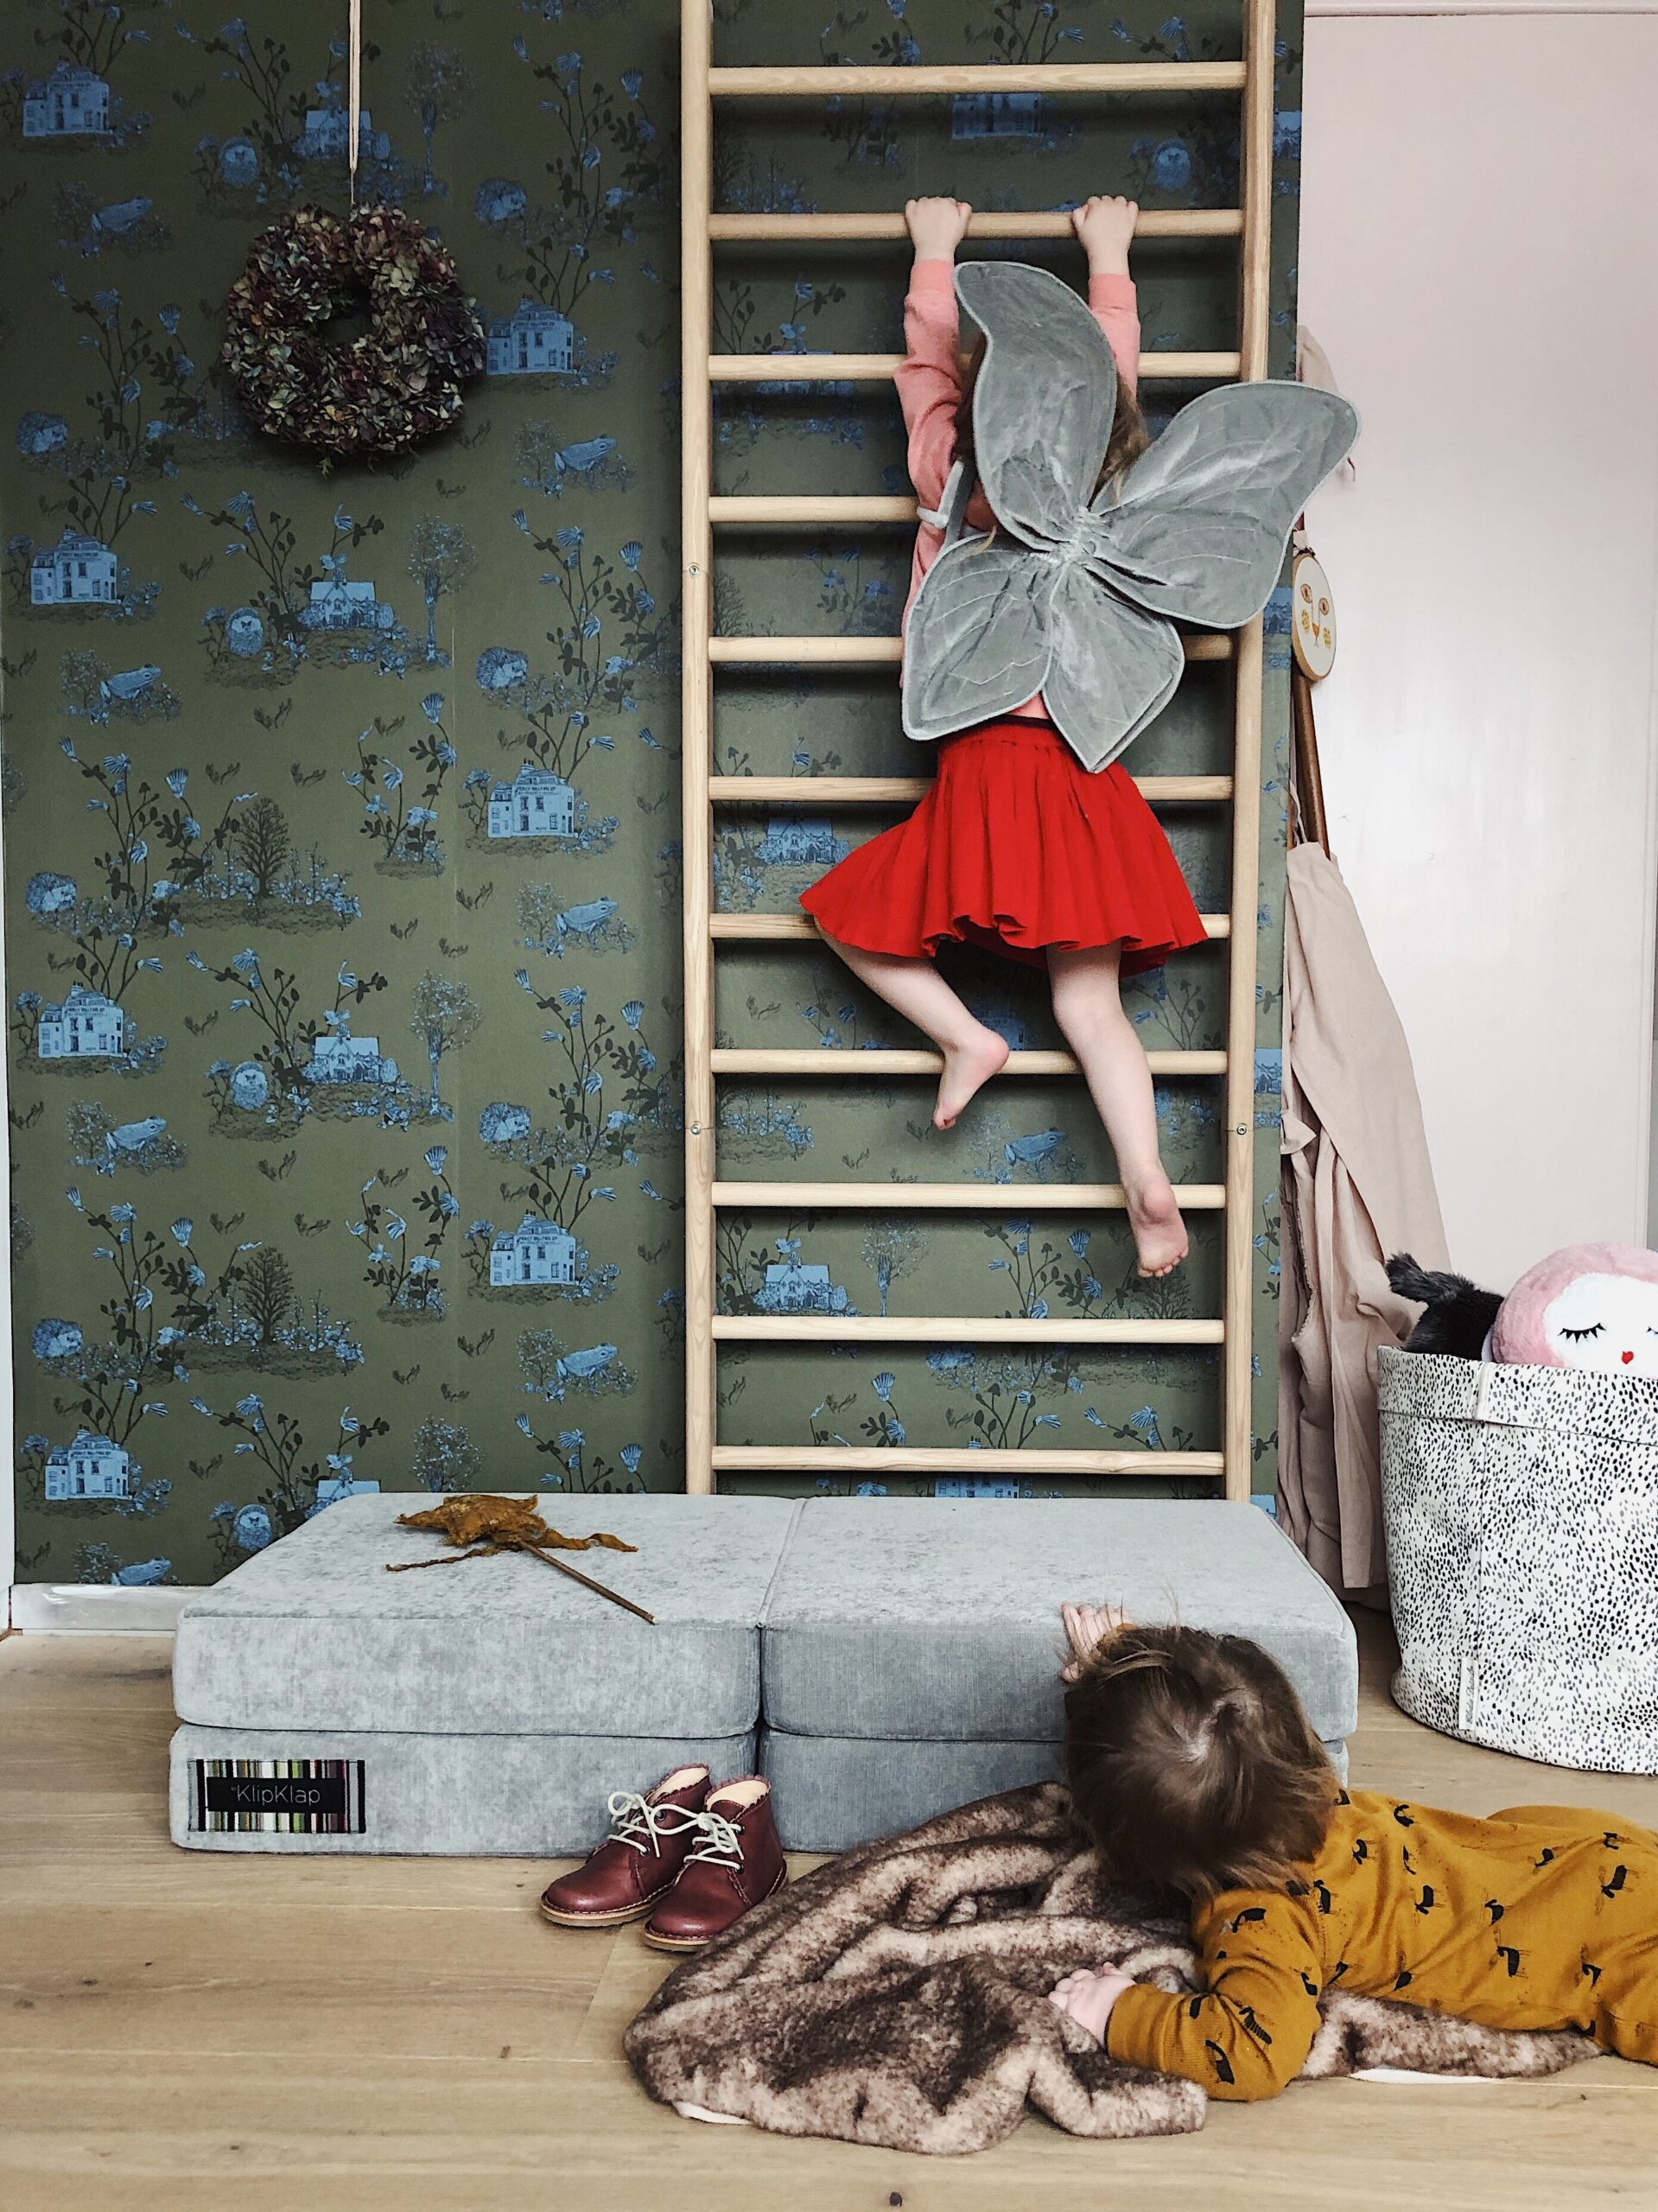 Full Size of Sprossenwand Kinderzimmer Interiorgoals Im Bei Eva Regal Regale Sofa Weiß Kinderzimmer Sprossenwand Kinderzimmer